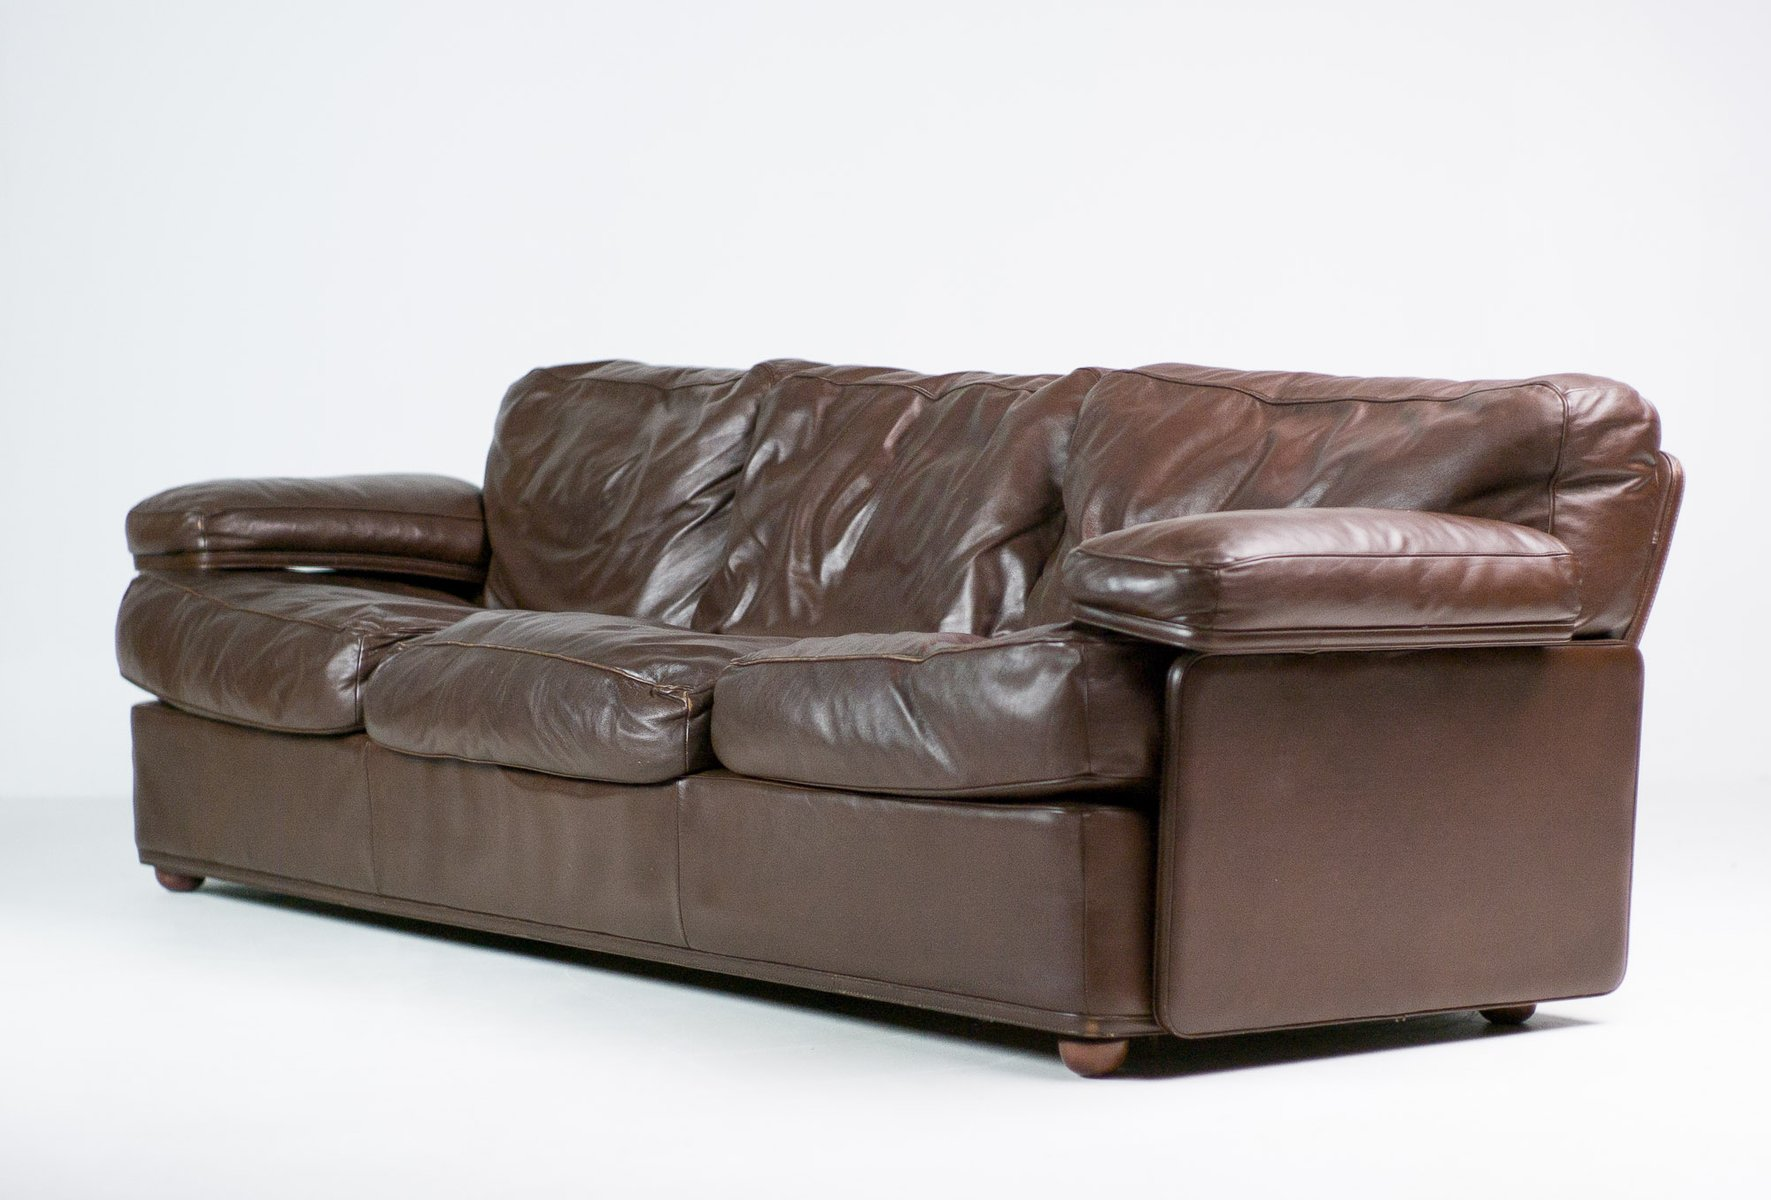 Italian modern sofa by tito agnoli for poltrona frau for for Italian designer sofas